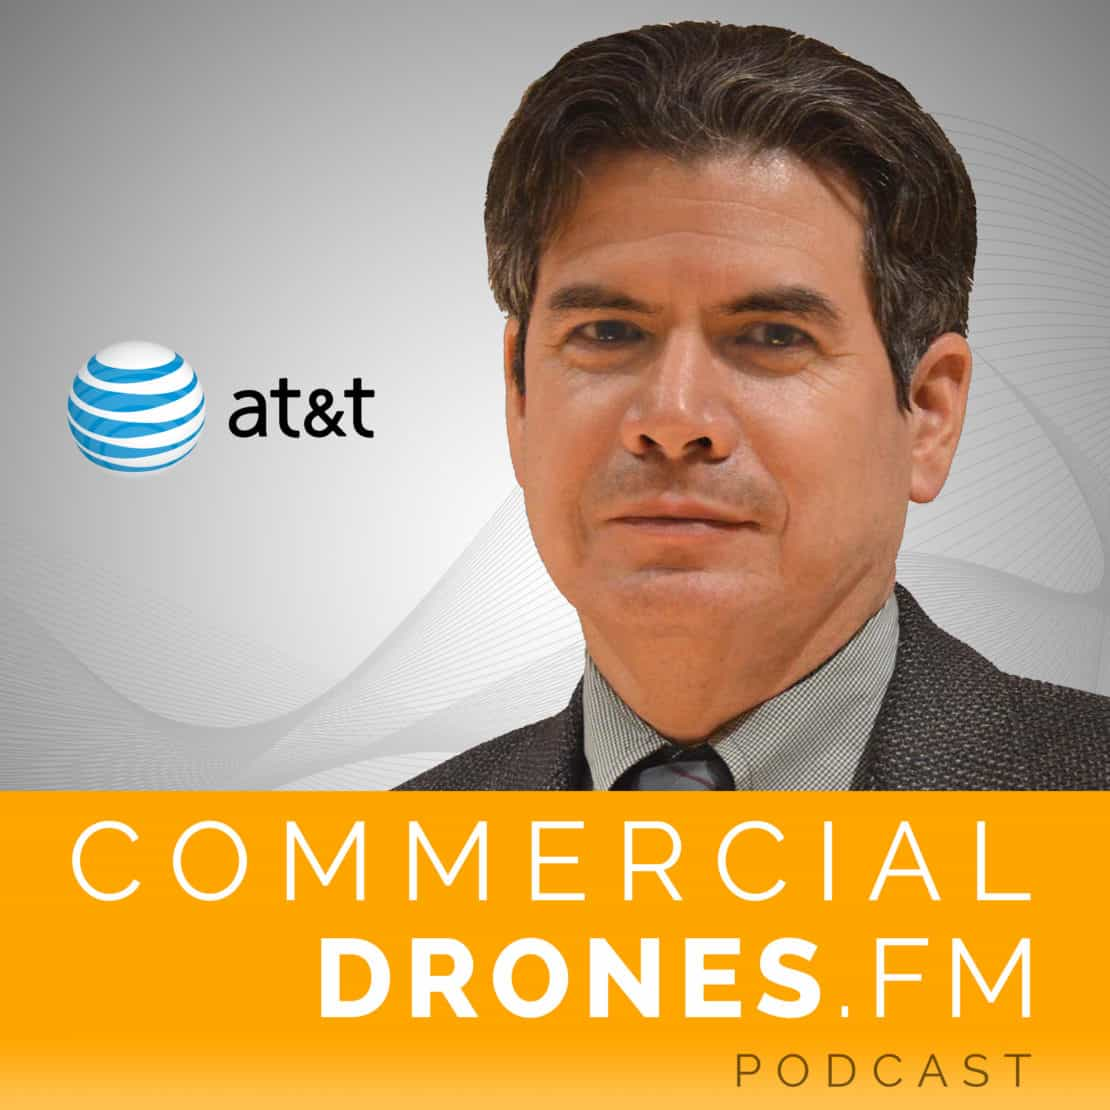 Commercial Drones FM Podcast - Art Pregler - AT&T drones 2